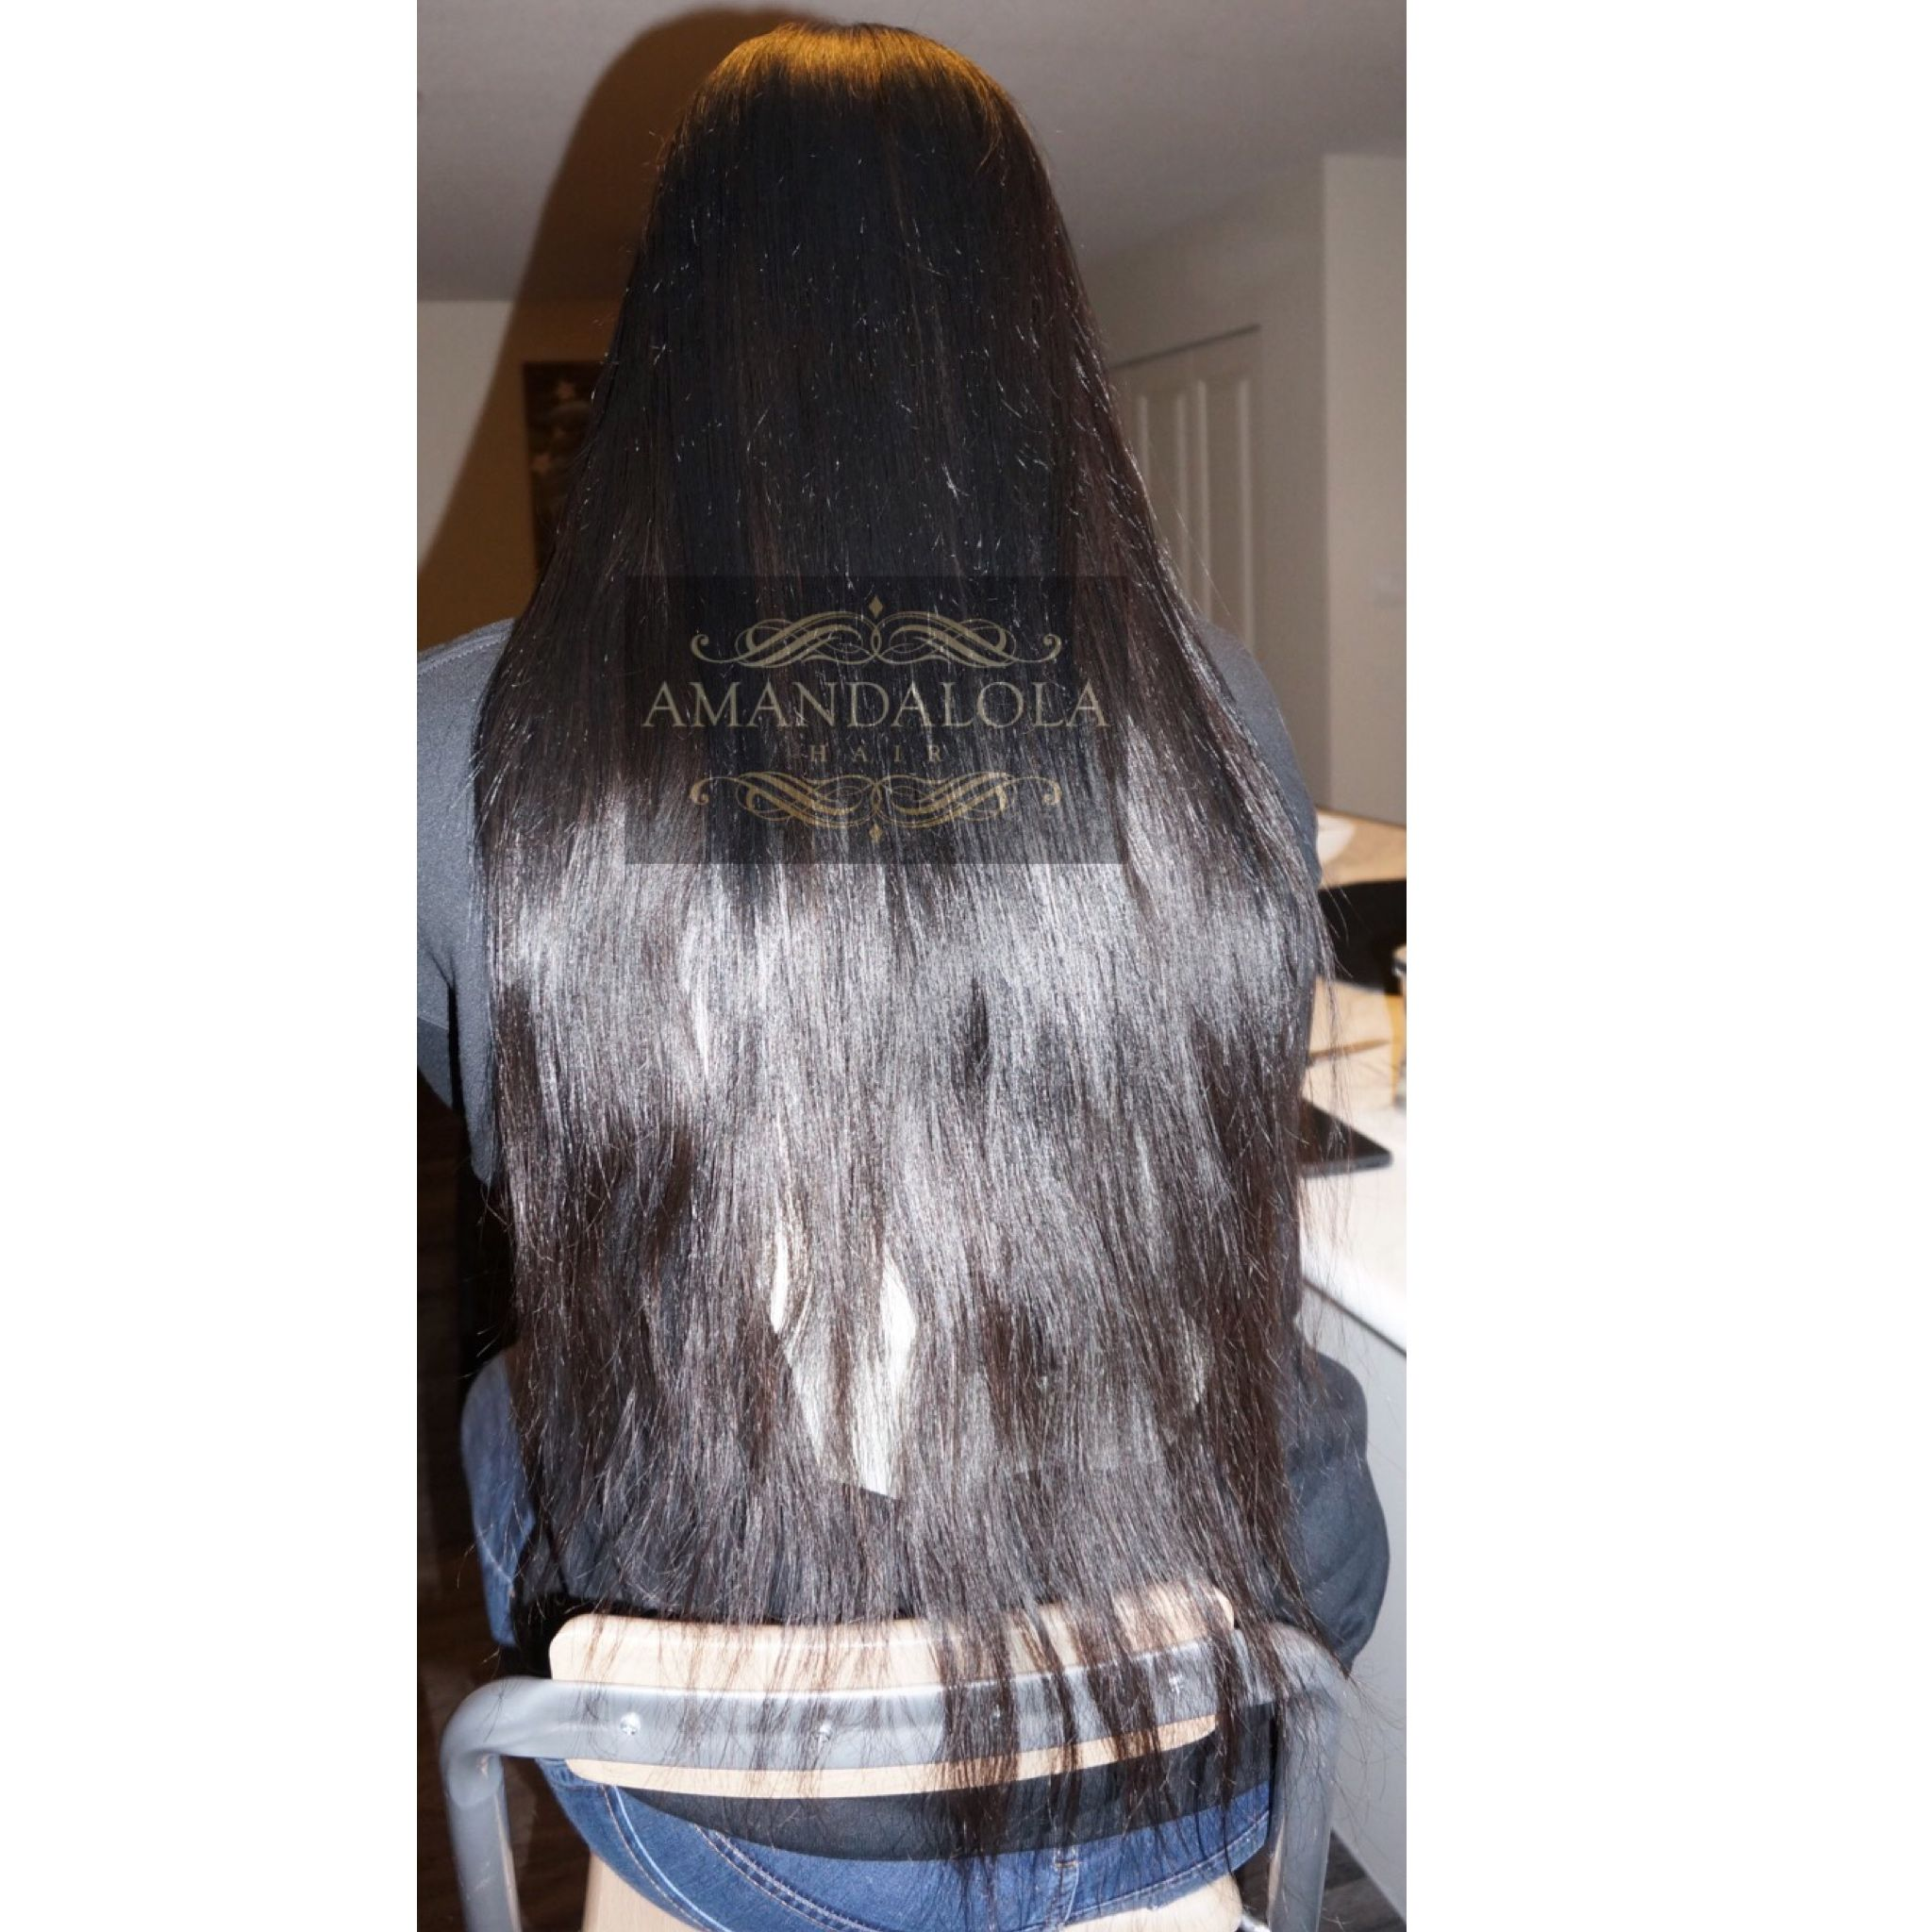 Amandalola Hair In 24 Body Wave 120 Grams Beautifulhair Hair